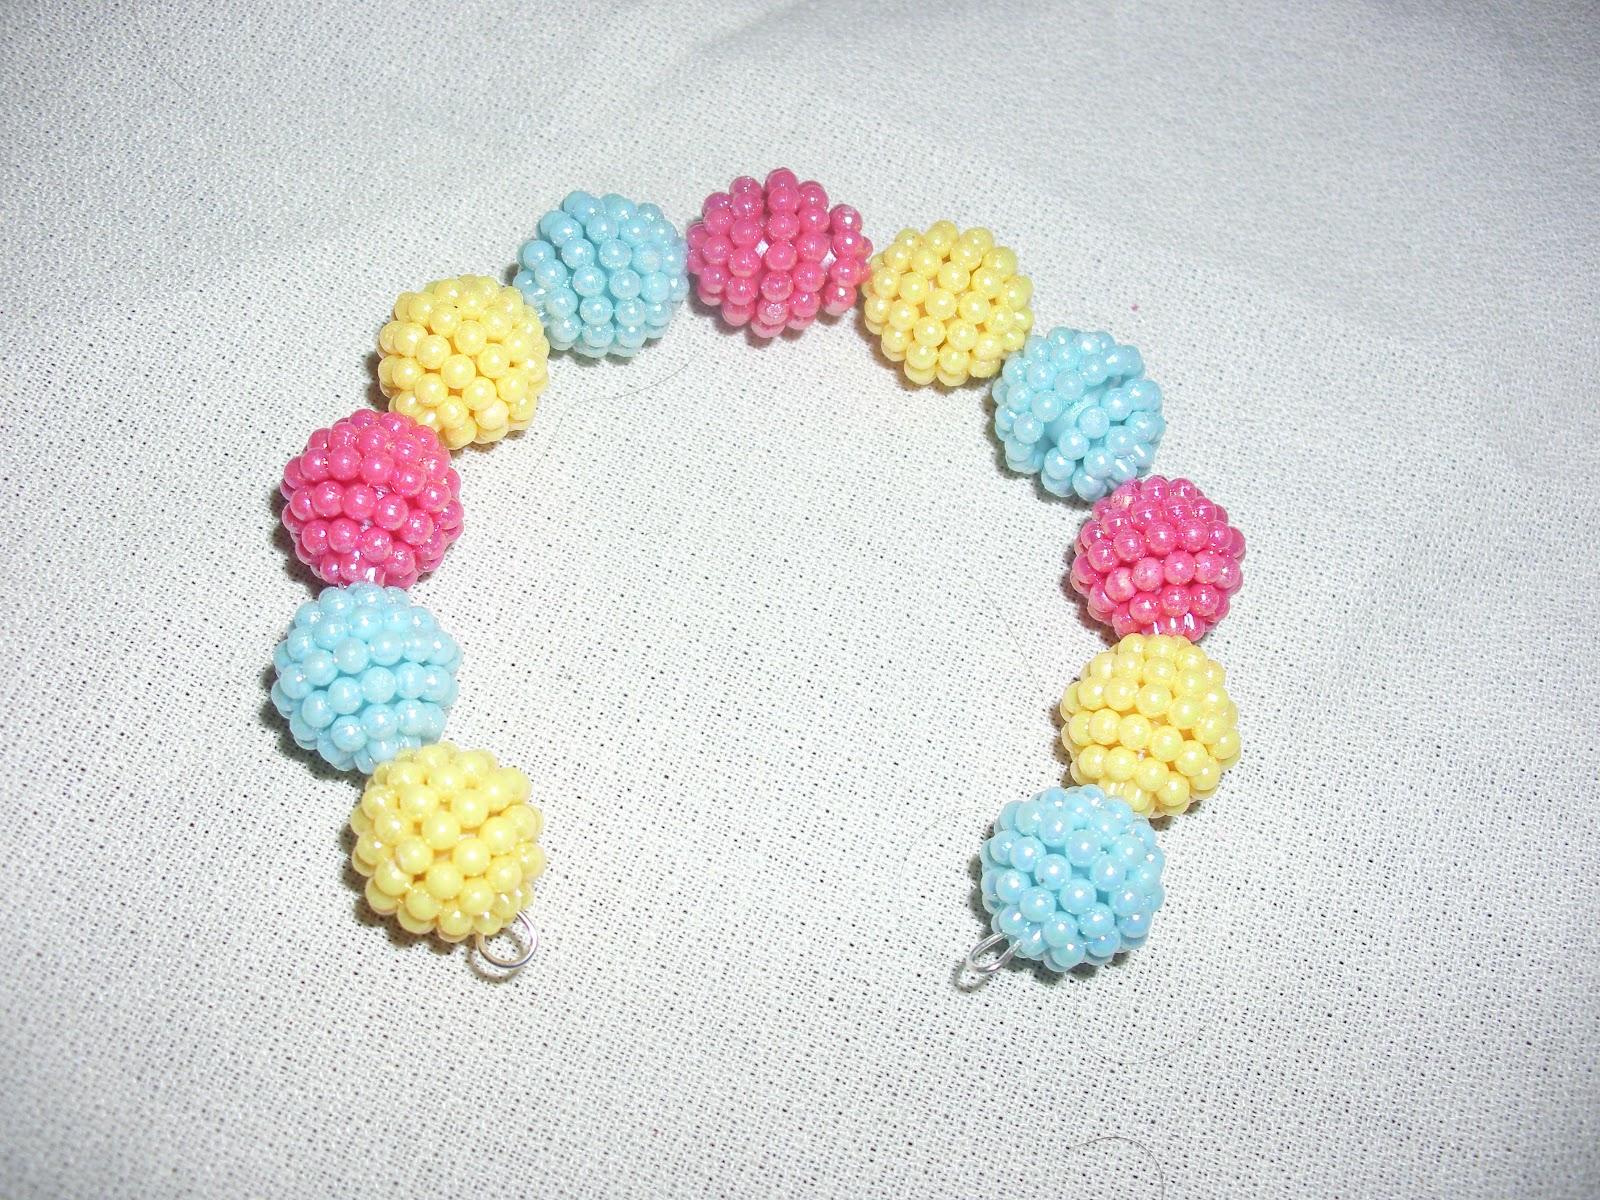 how to make a bracelet sizer